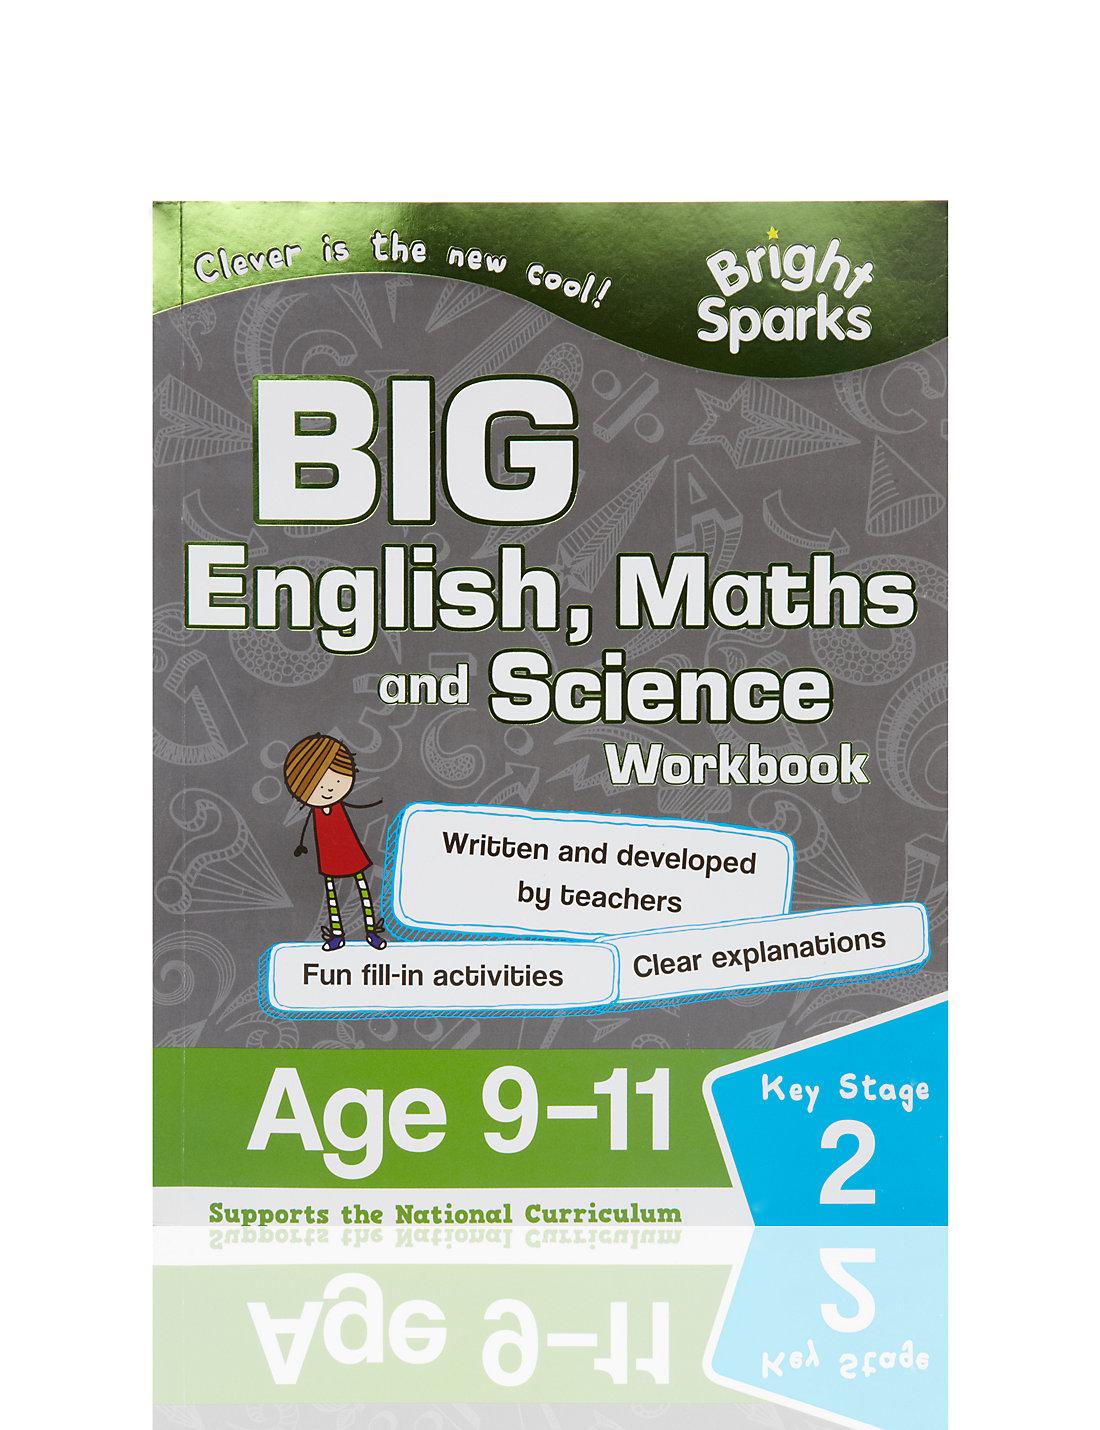 Workbooks key stage 2 workbooks : Bright Sparks Key Stage 2 Big English, Maths & Science Workbook | M&S